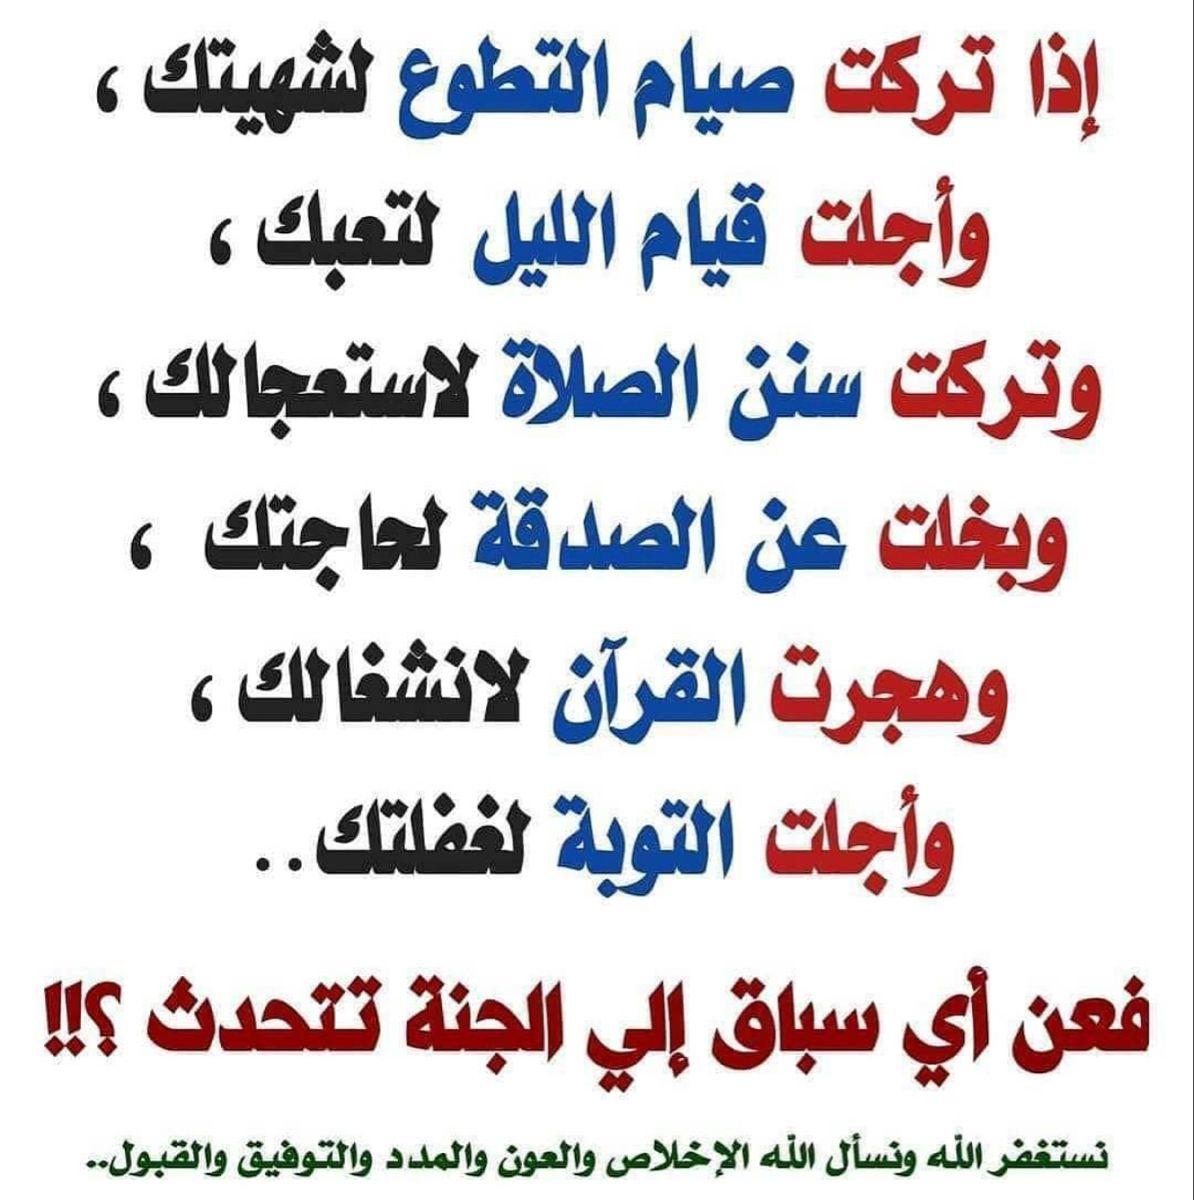 Pin By Albaraa Network On الاسلام In 2021 Arabic Calligraphy Calligraphy My World